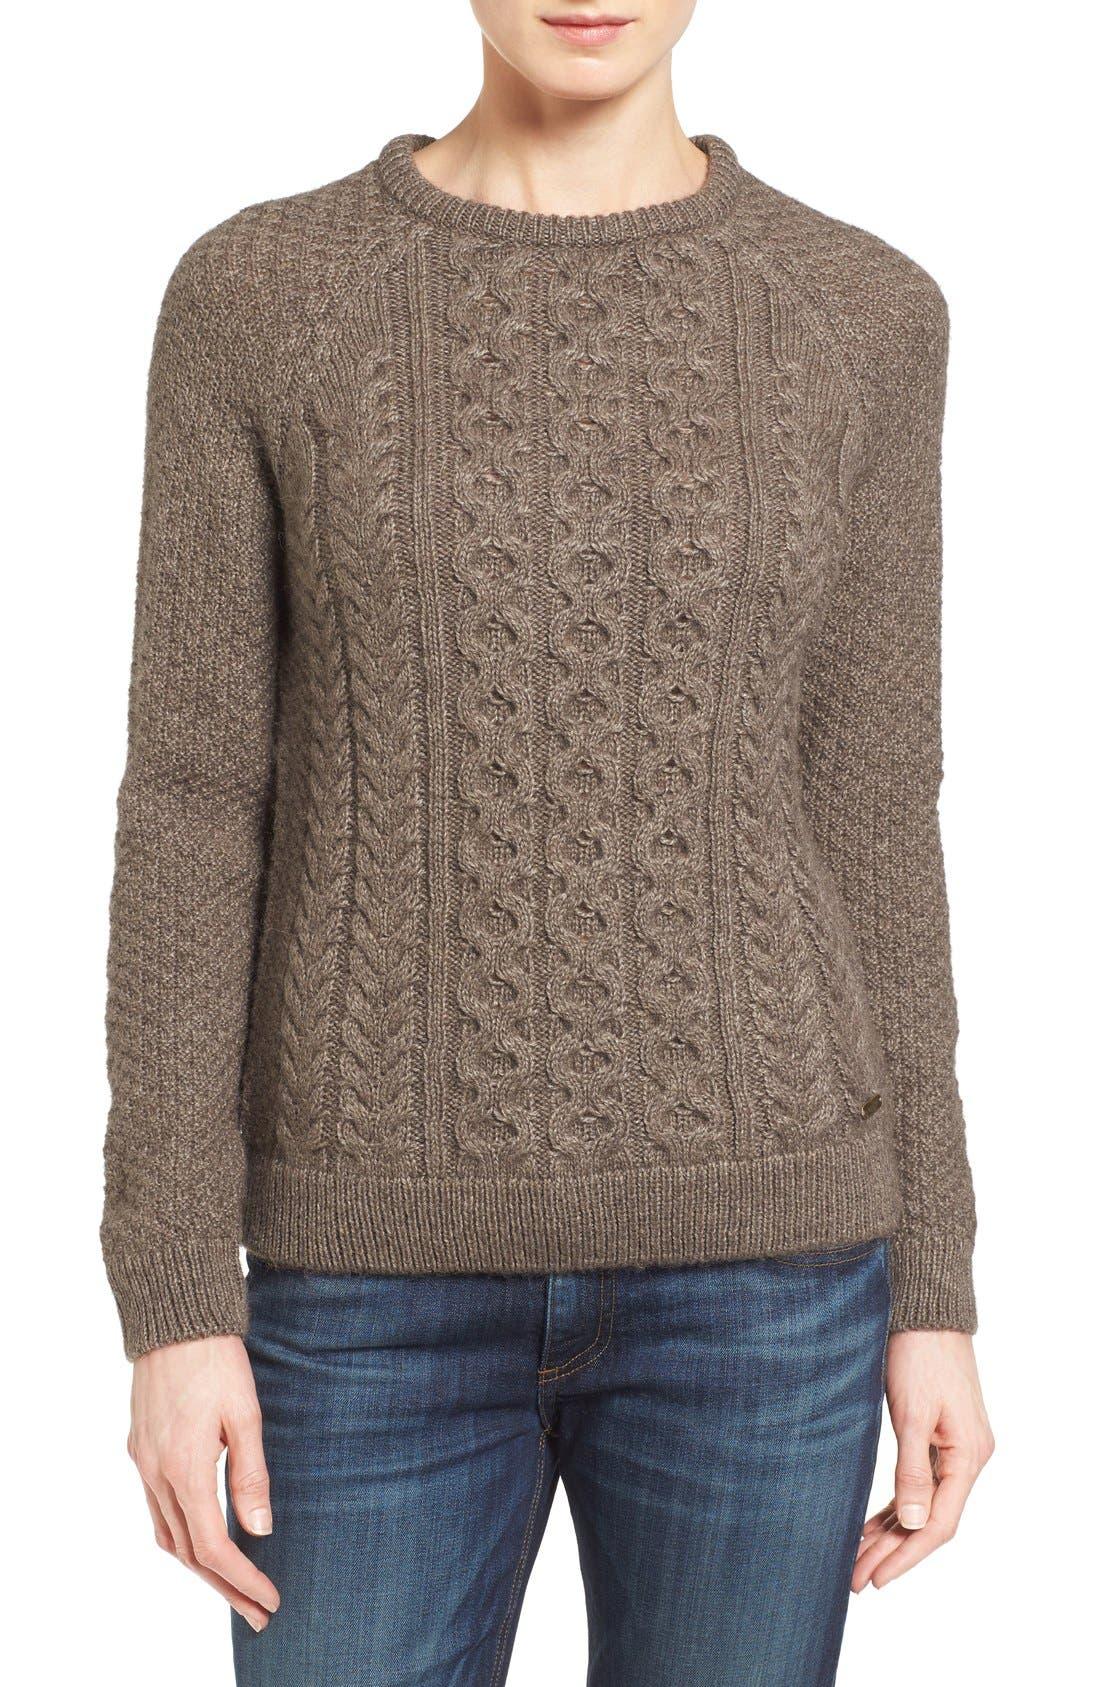 Cable Knit Crewneck Sweater,                             Main thumbnail 1, color,                             270